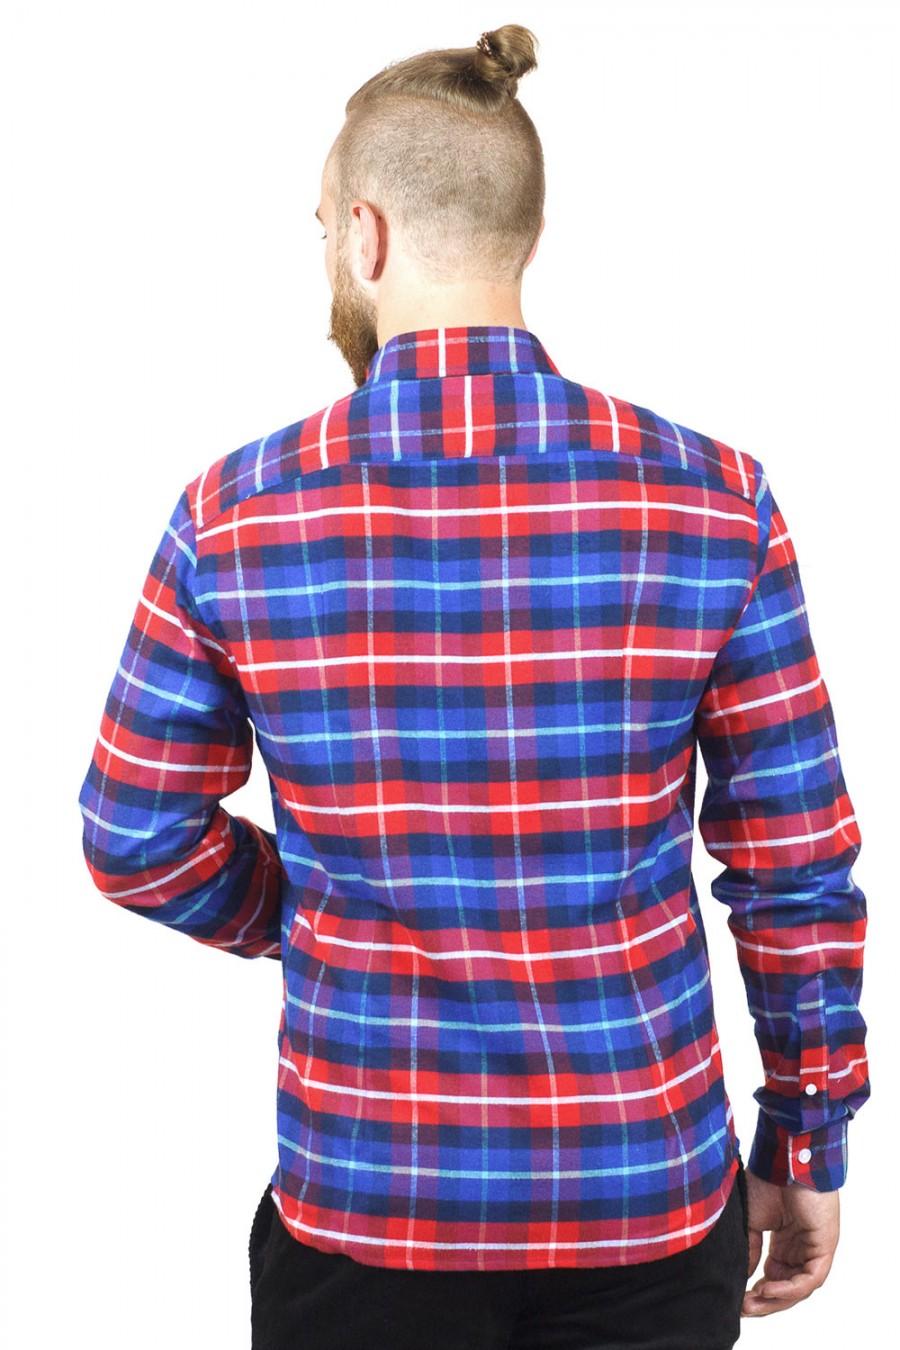 Красная клетчатая рубашка S-109-1